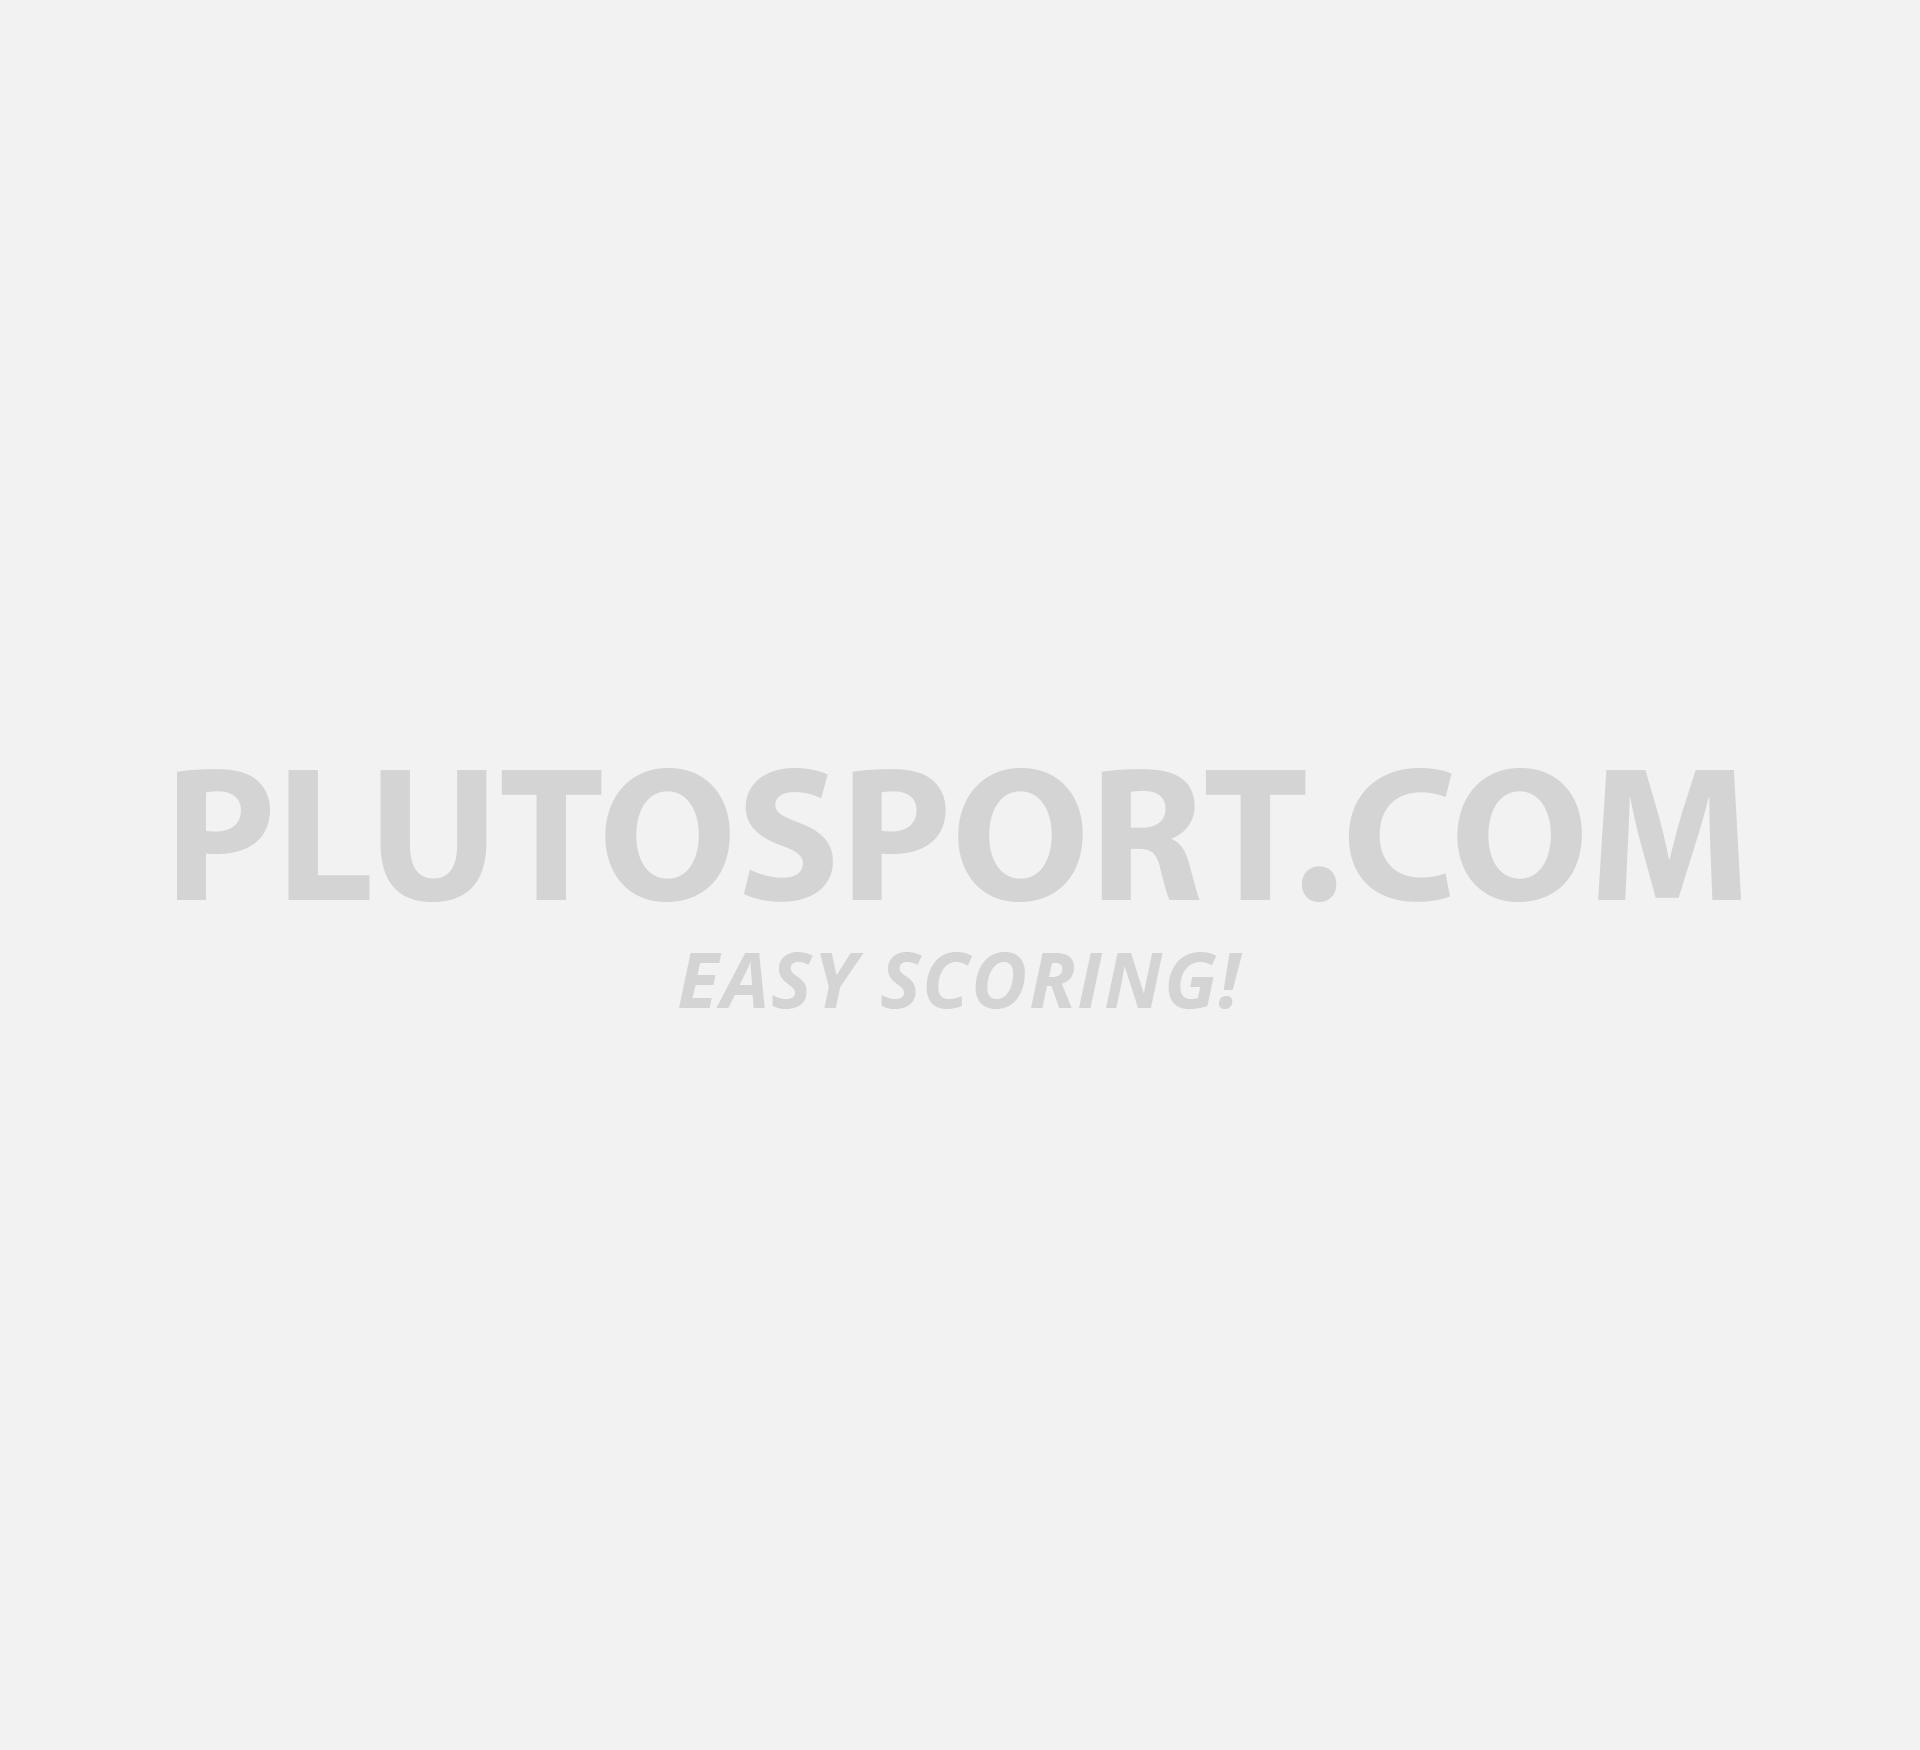 adidas copa mundial fg voetbalschoenen heren